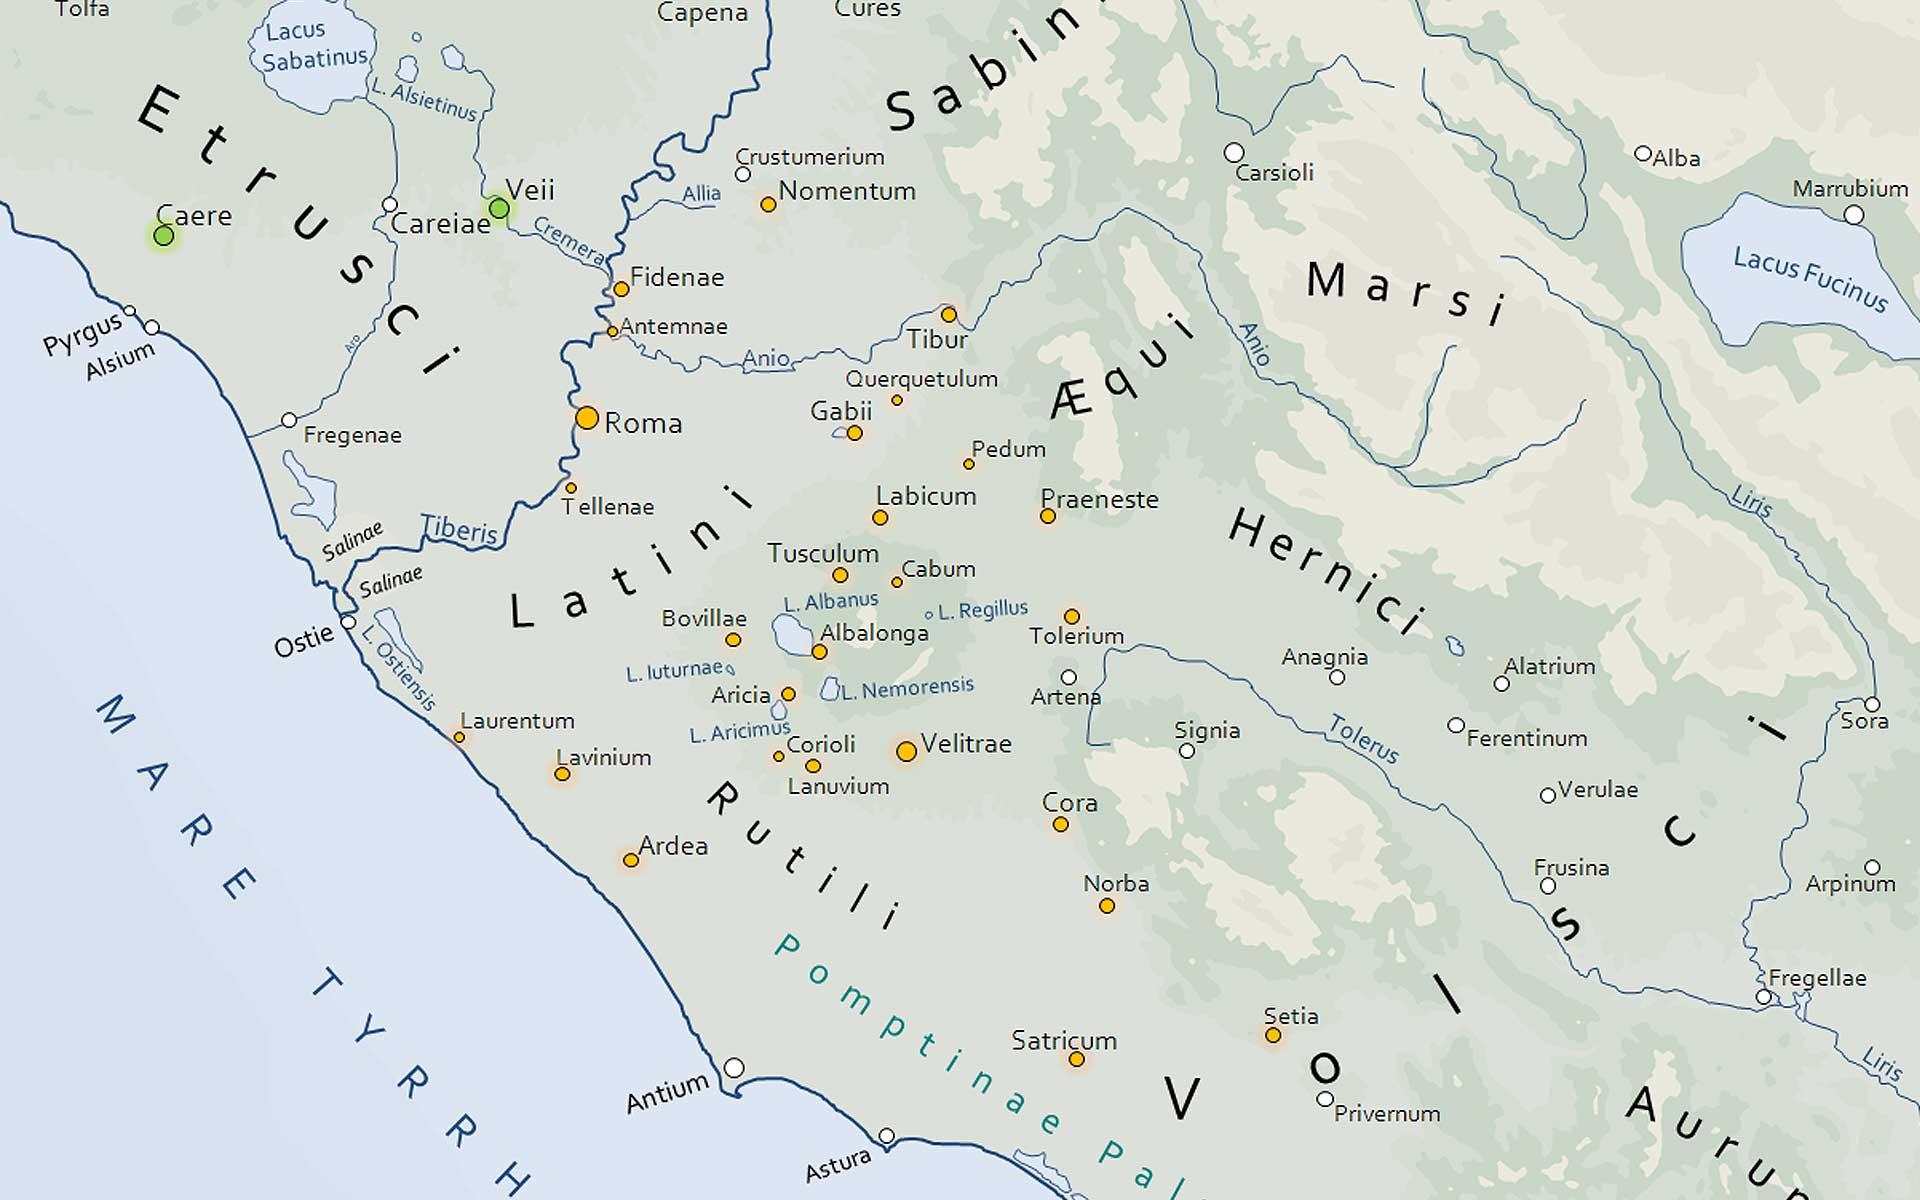 mappa-lingue-latine